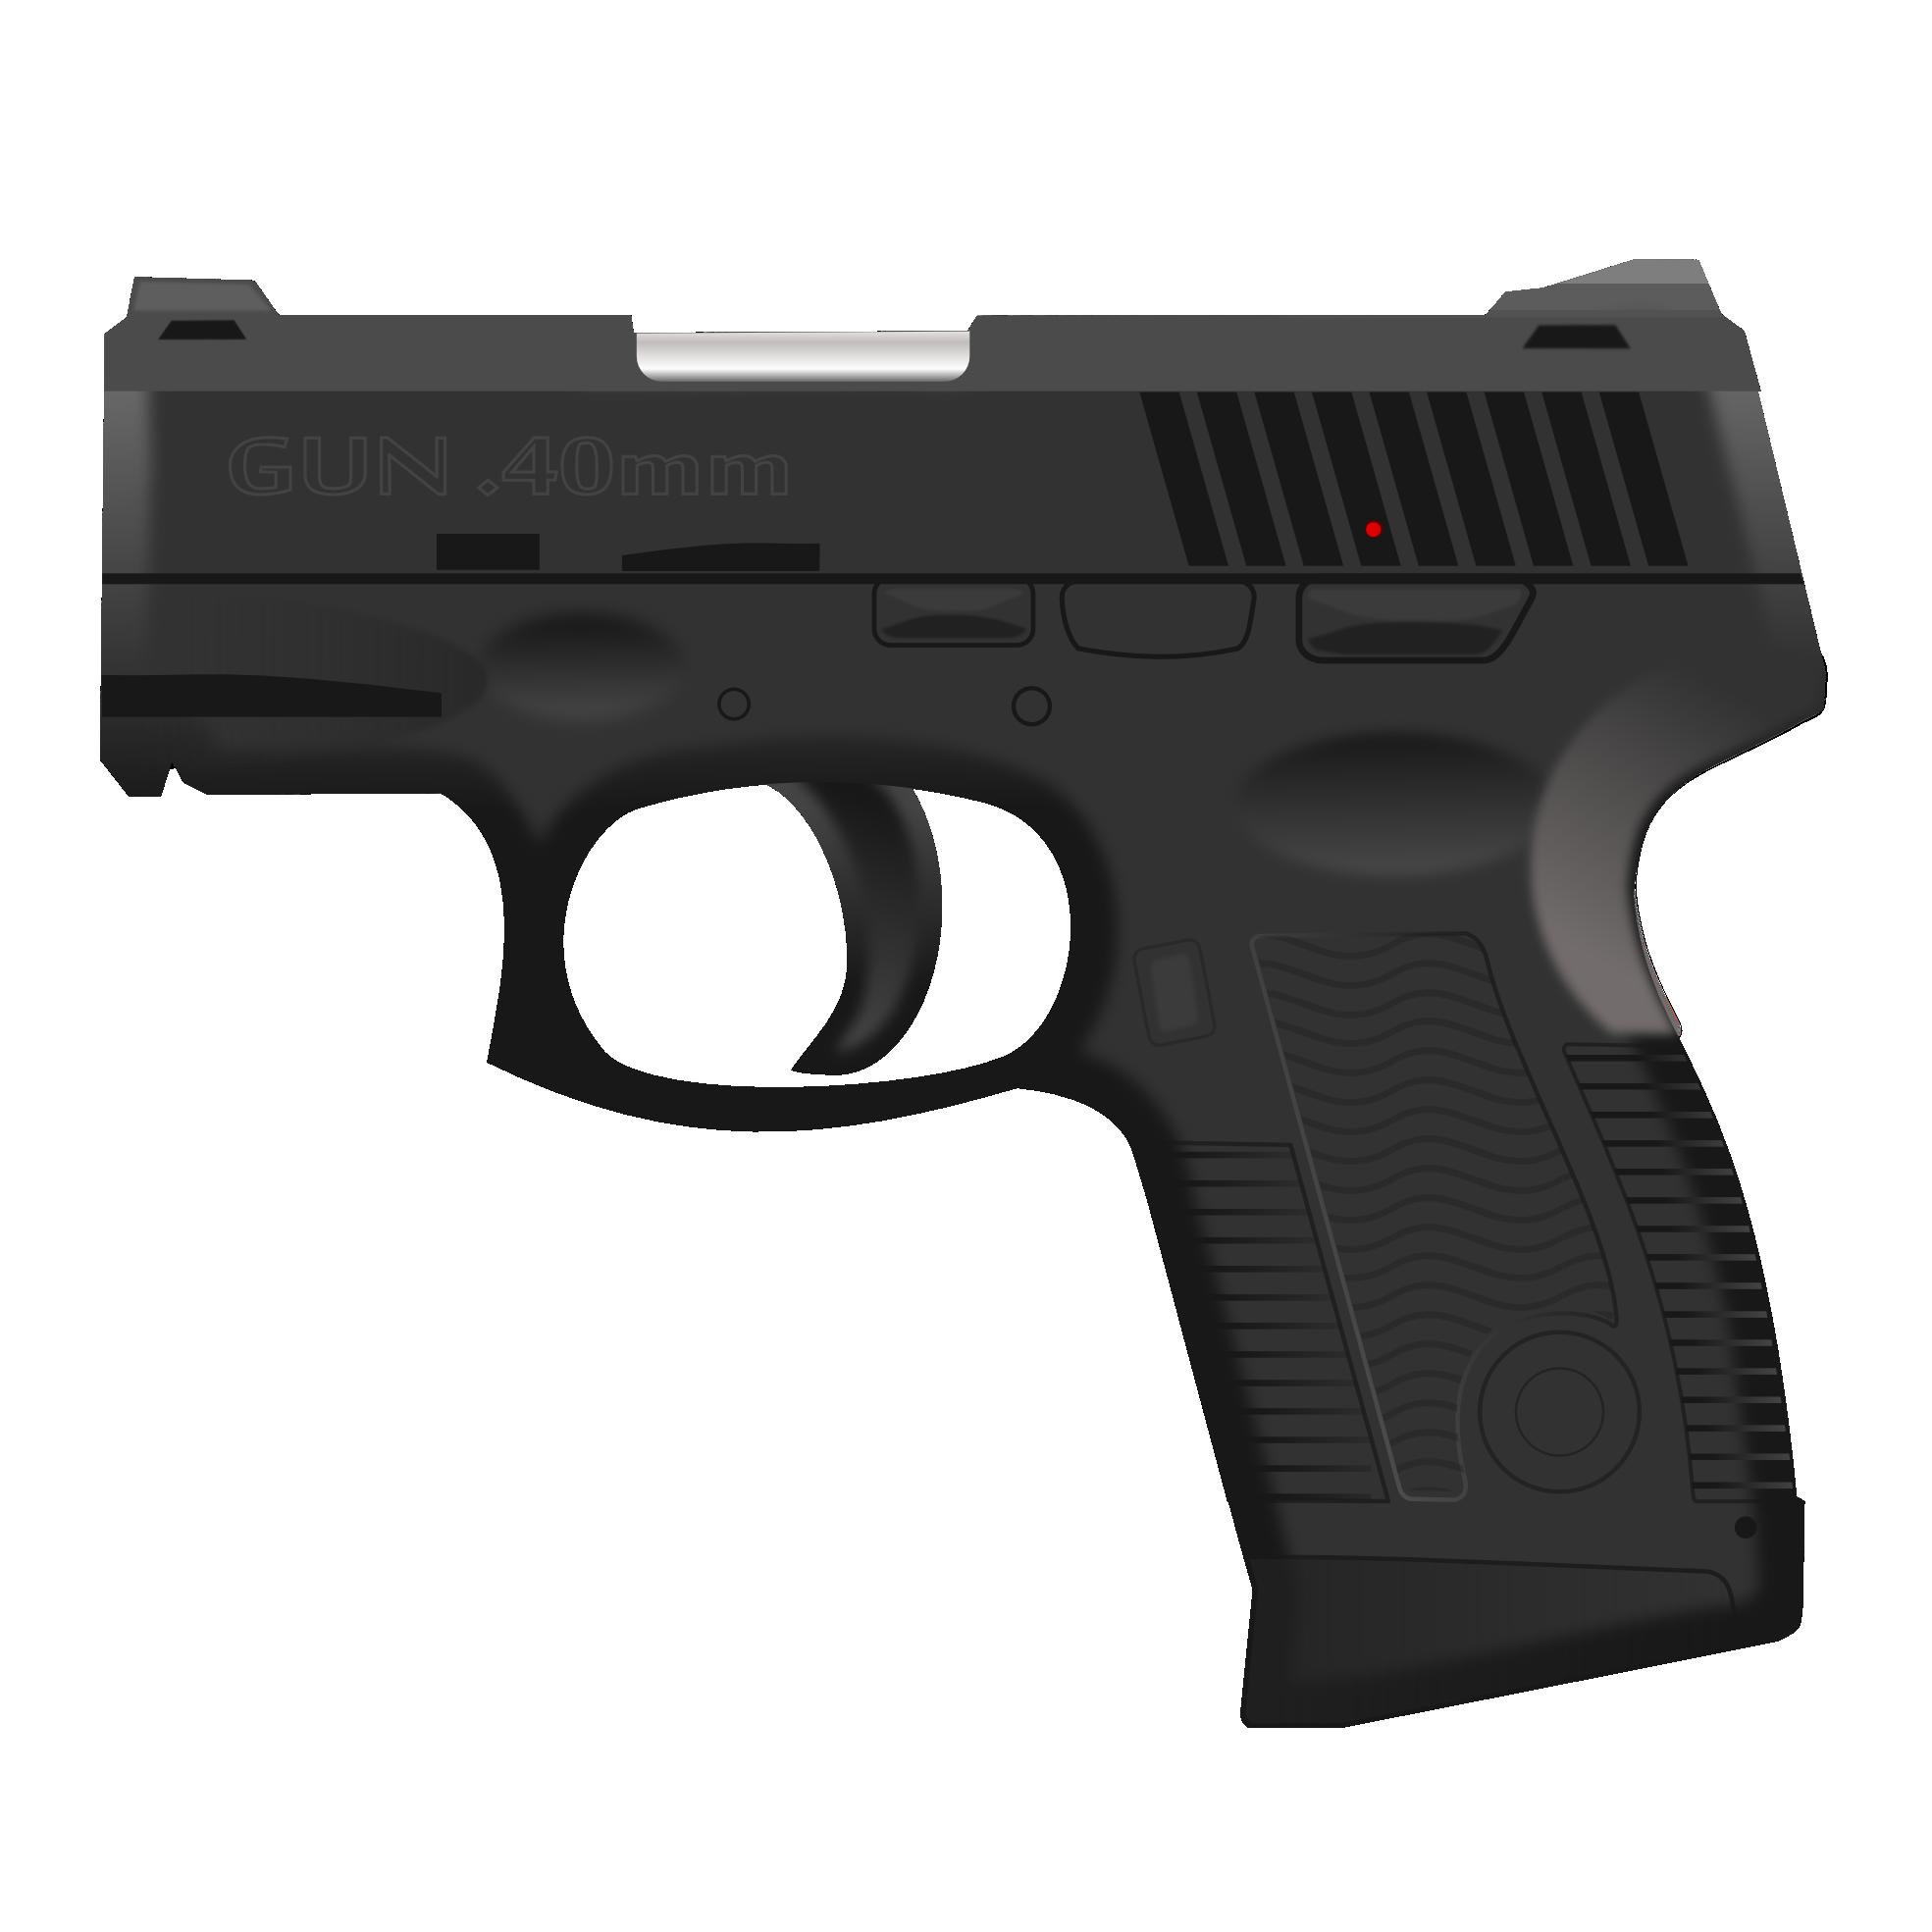 Gun Kidfriendly PNG Image